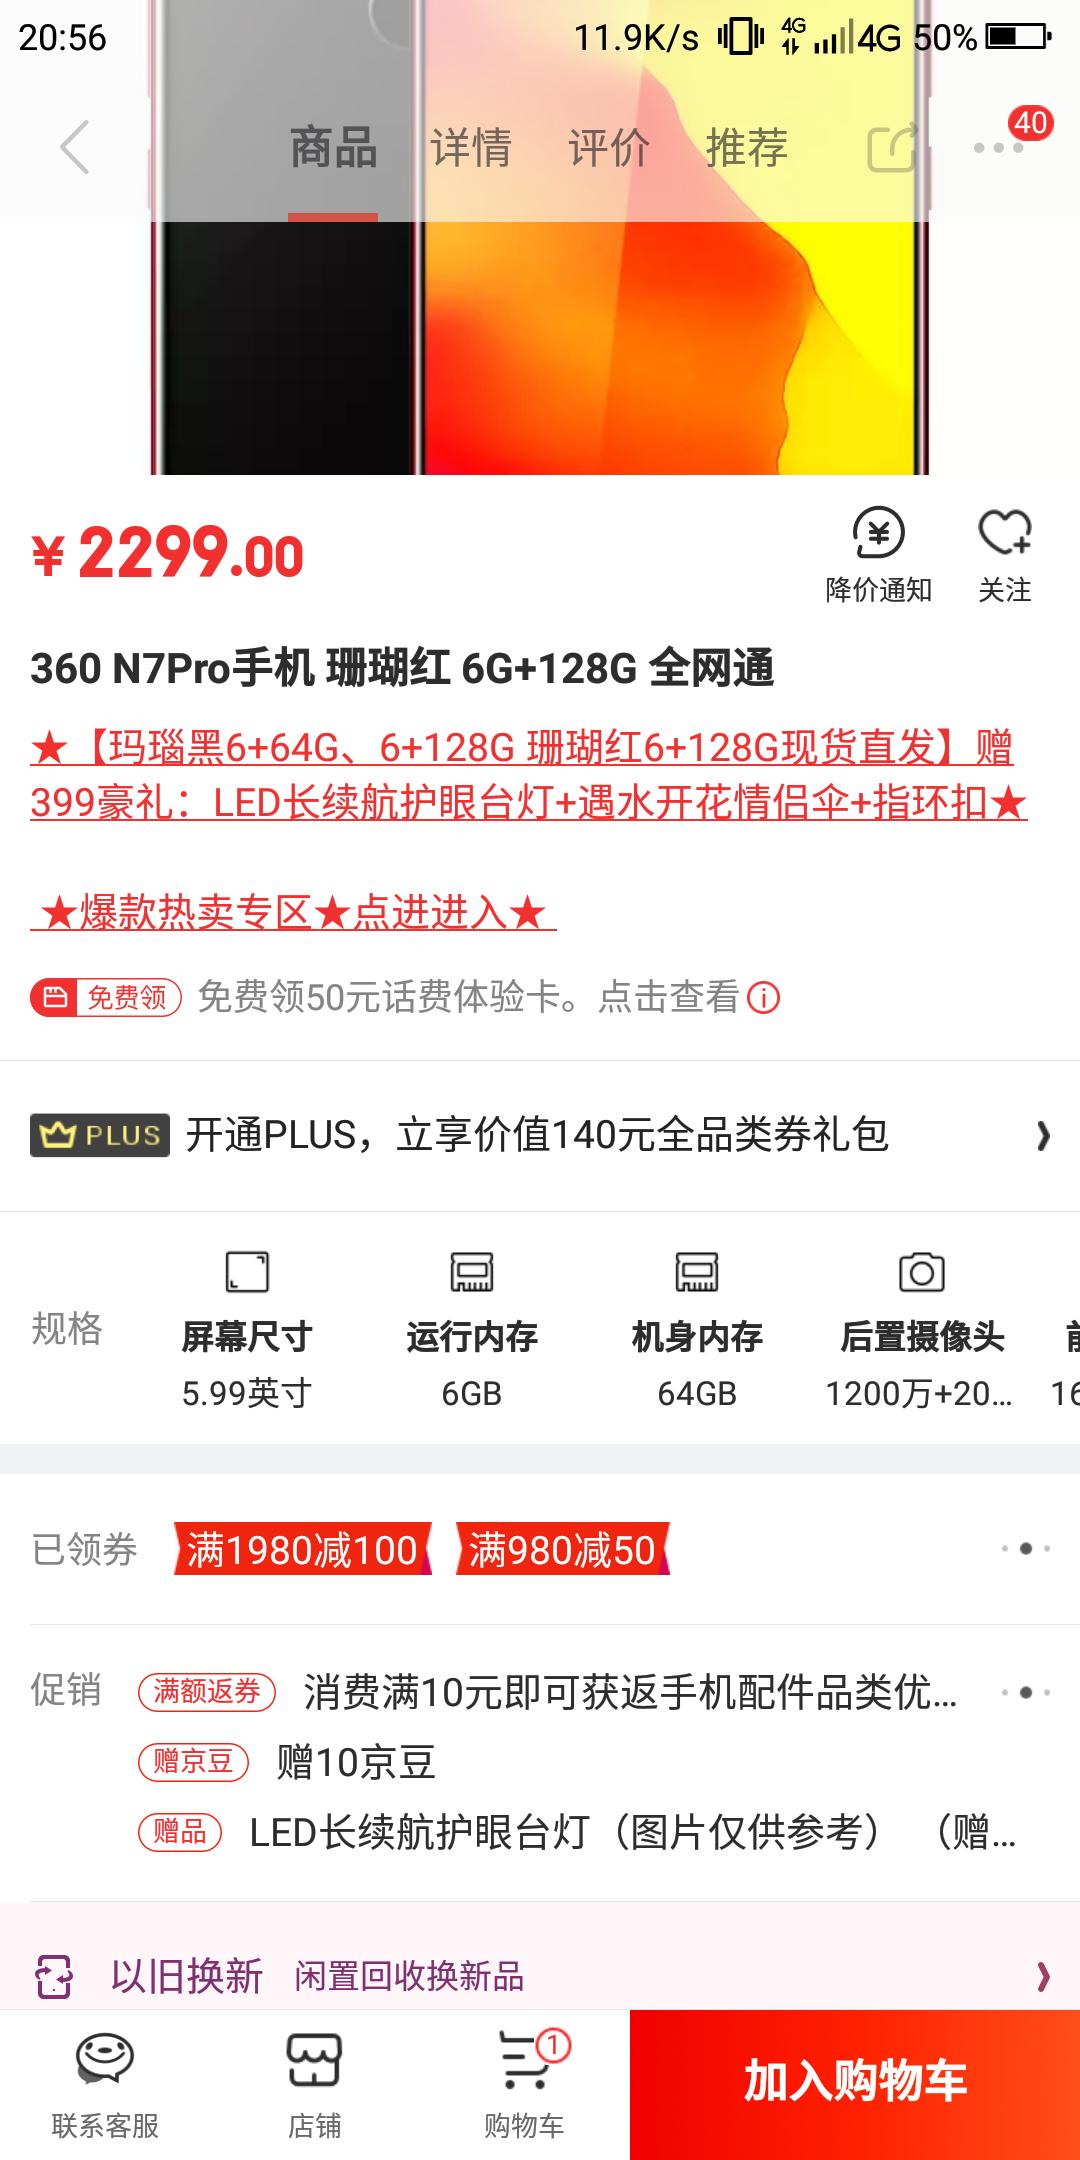 Screenshot_2018-09-12-20-56-34.png